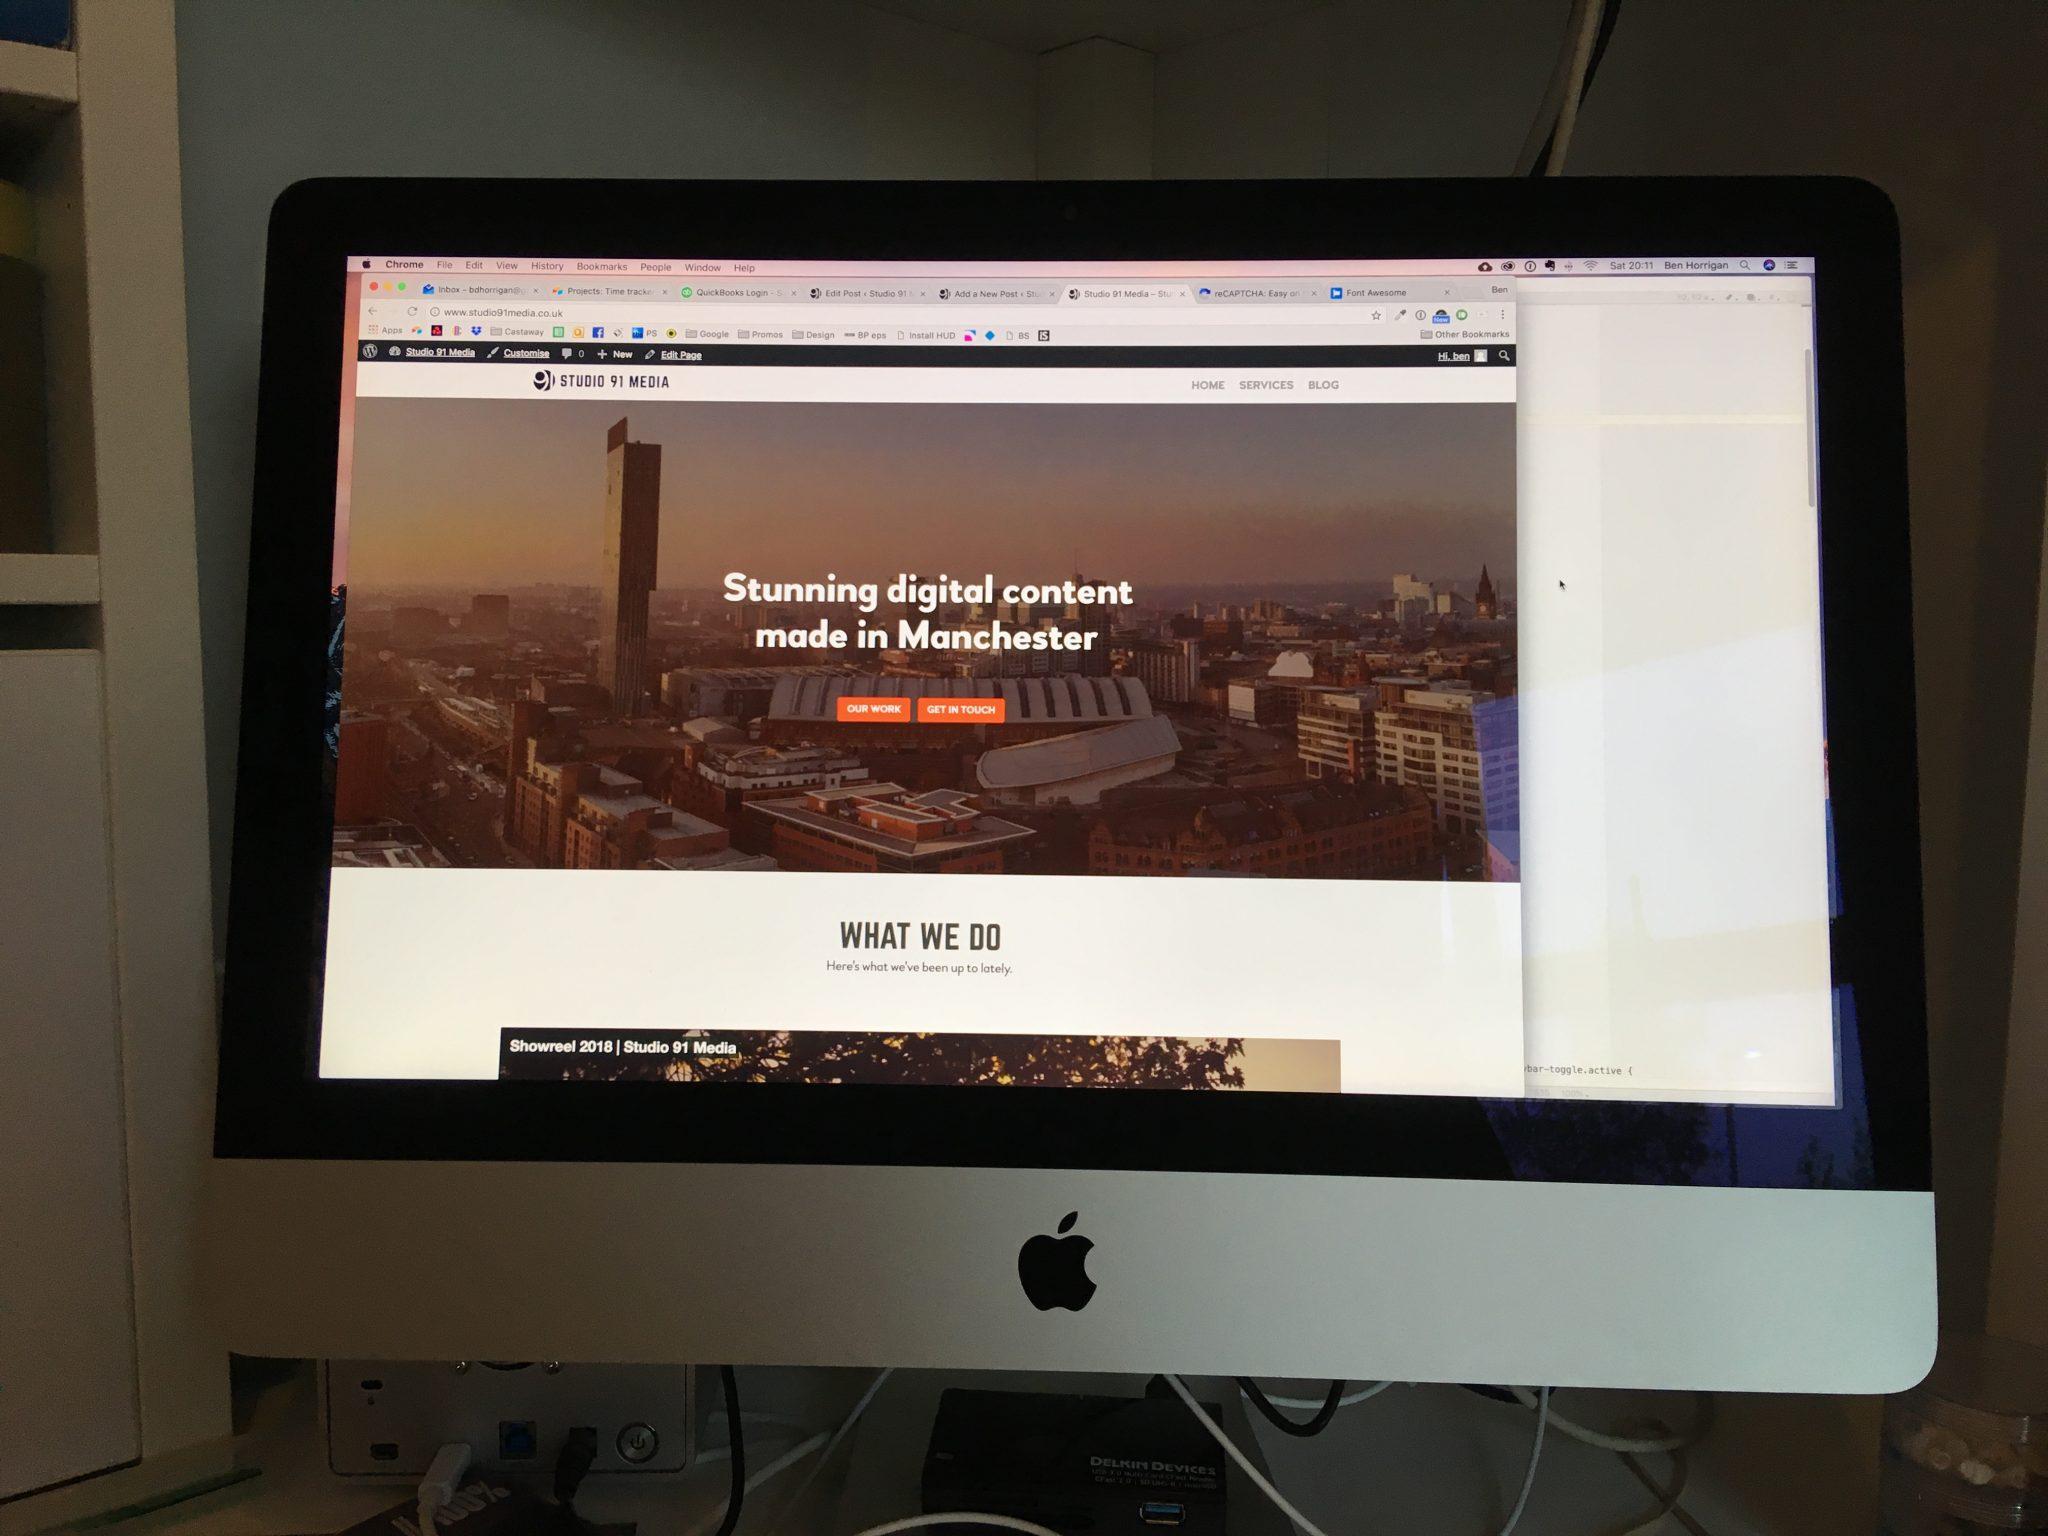 Apple iMac screen displaying Studio 91 Media website